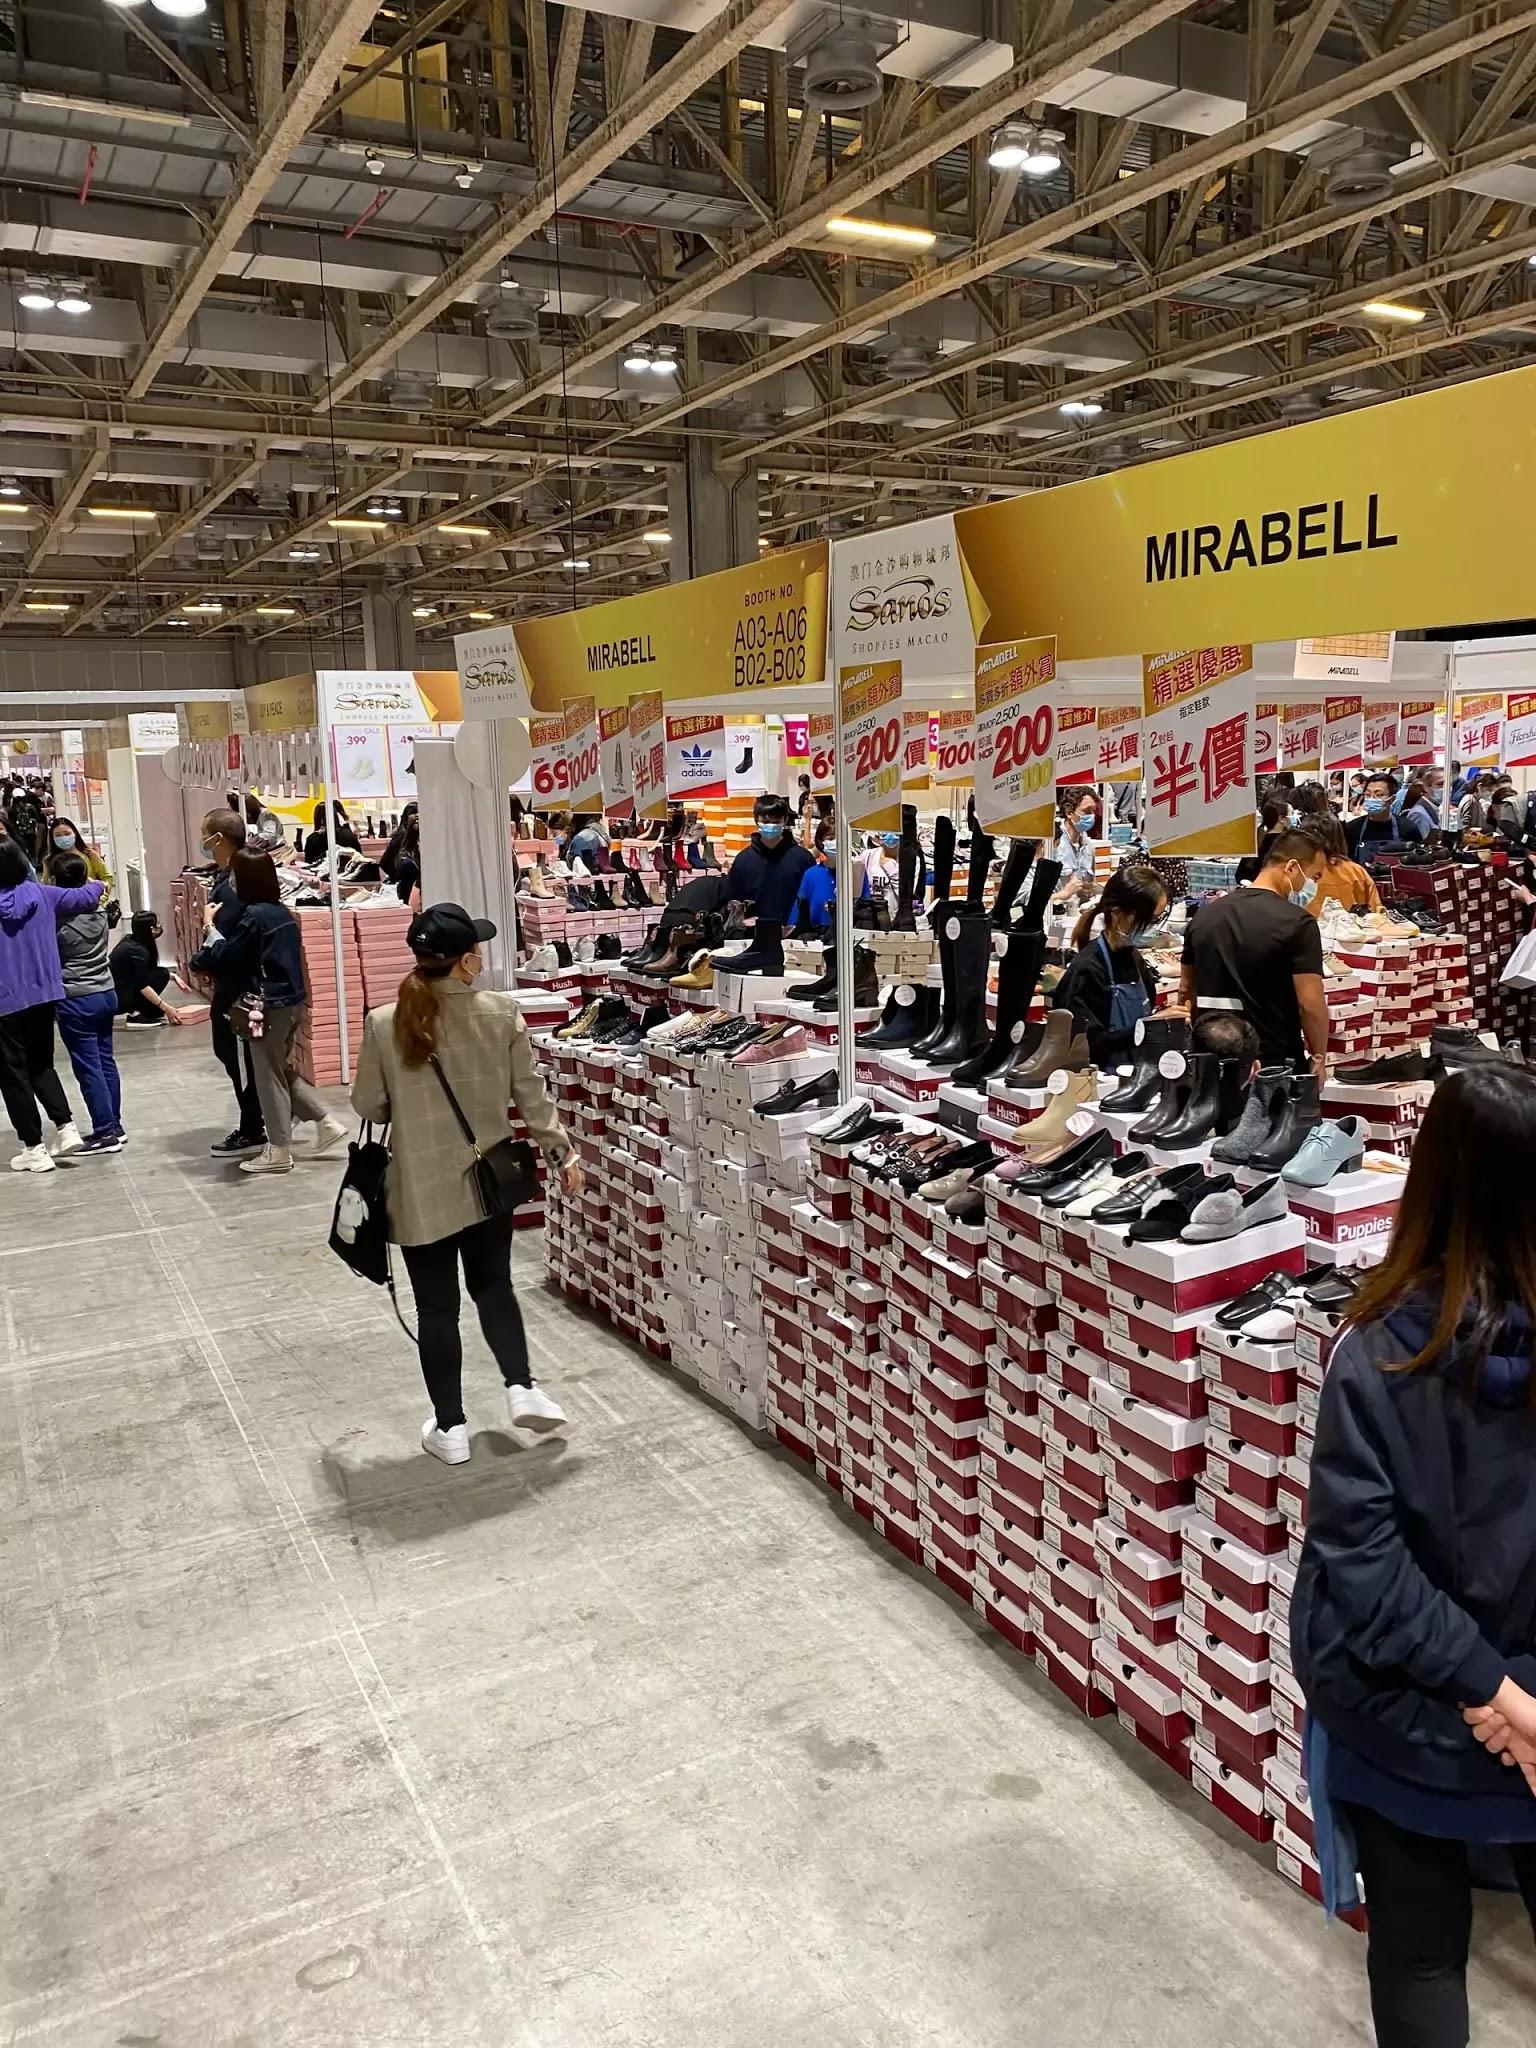 images of sales recalls customer